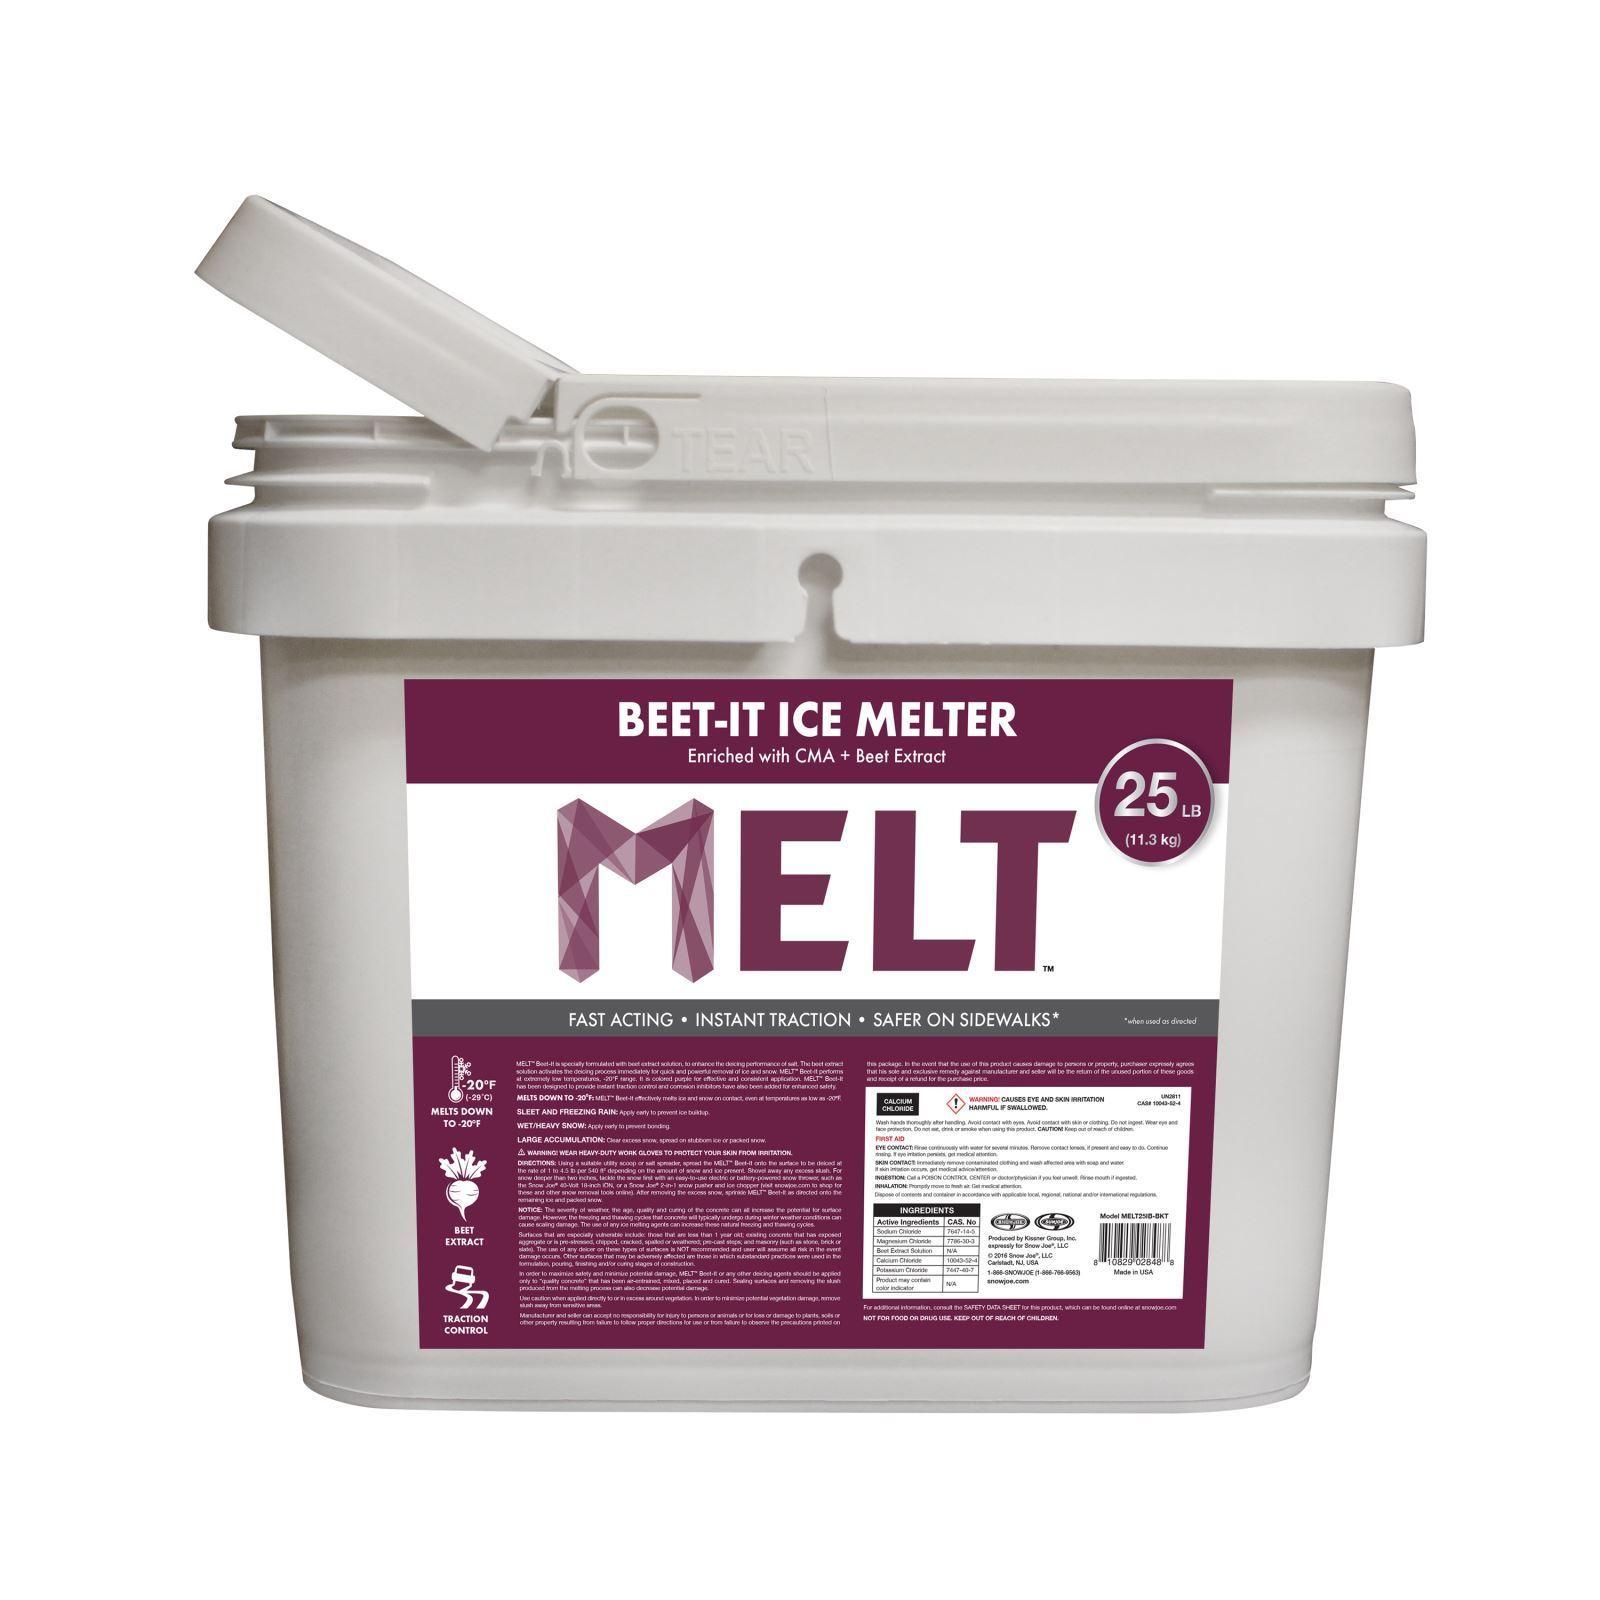 Snow Joe Melt 25 Lb. Bucket Beet (Red)-It Ice Melter w/ C...